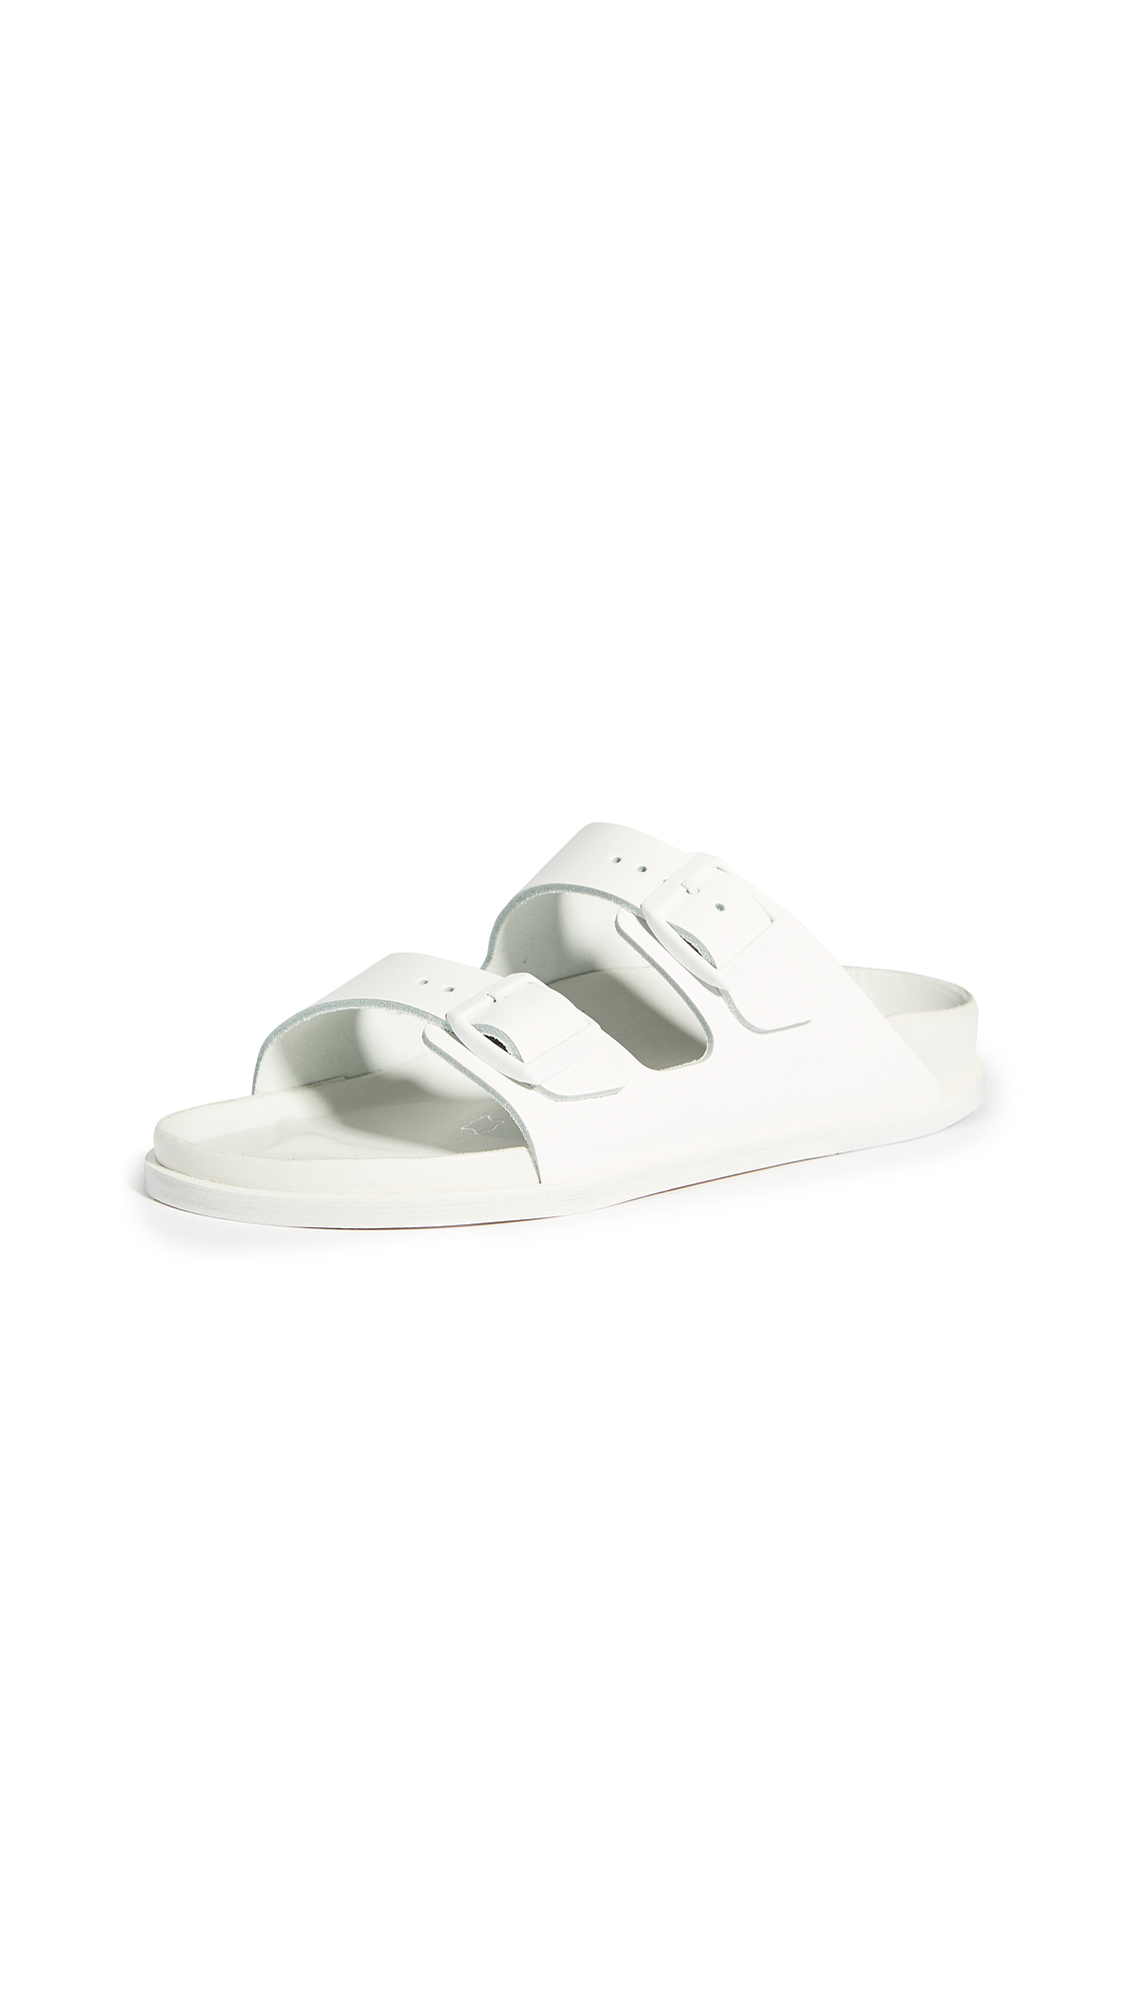 Birkenstock 1774 Arizona Premium Sandals - Narrow